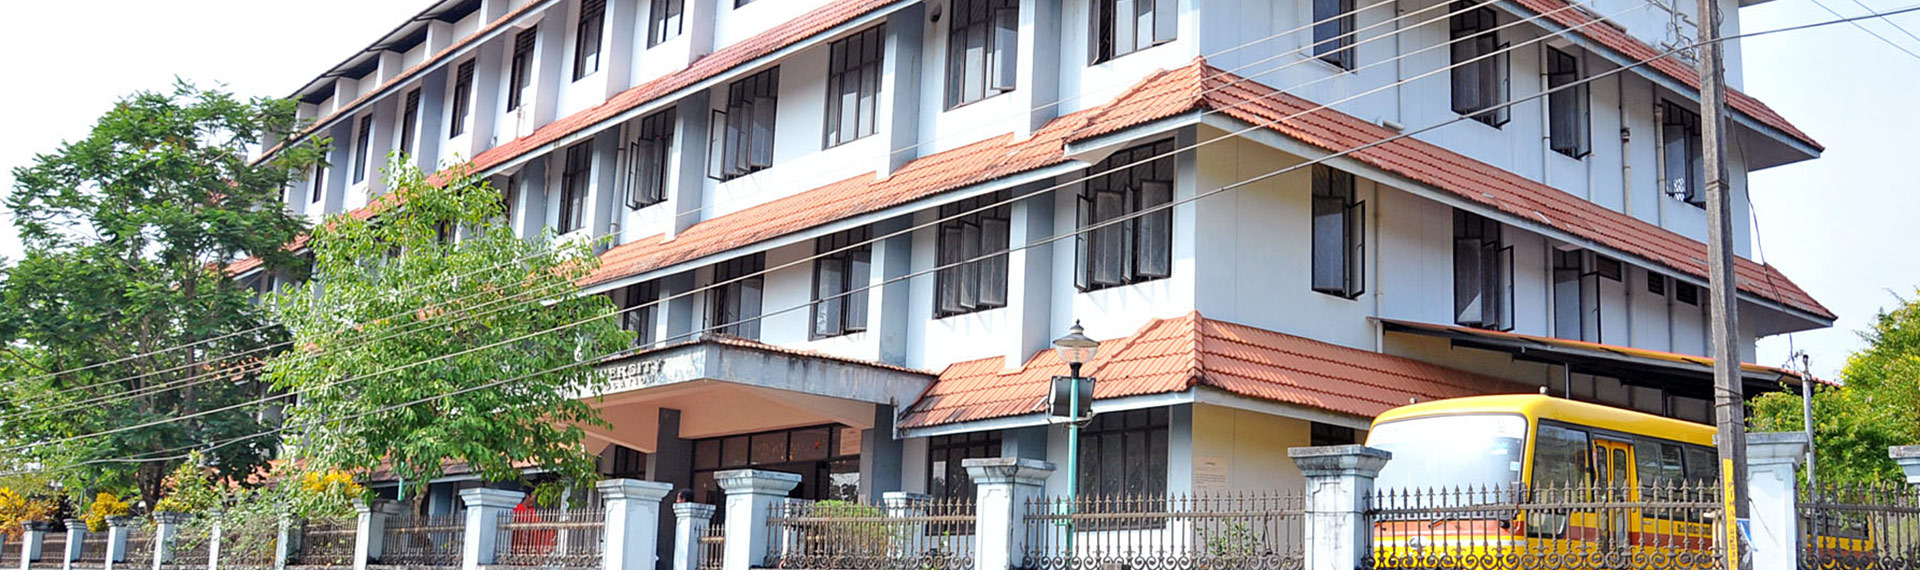 Institute Of Nursing Education School Of Medical Education